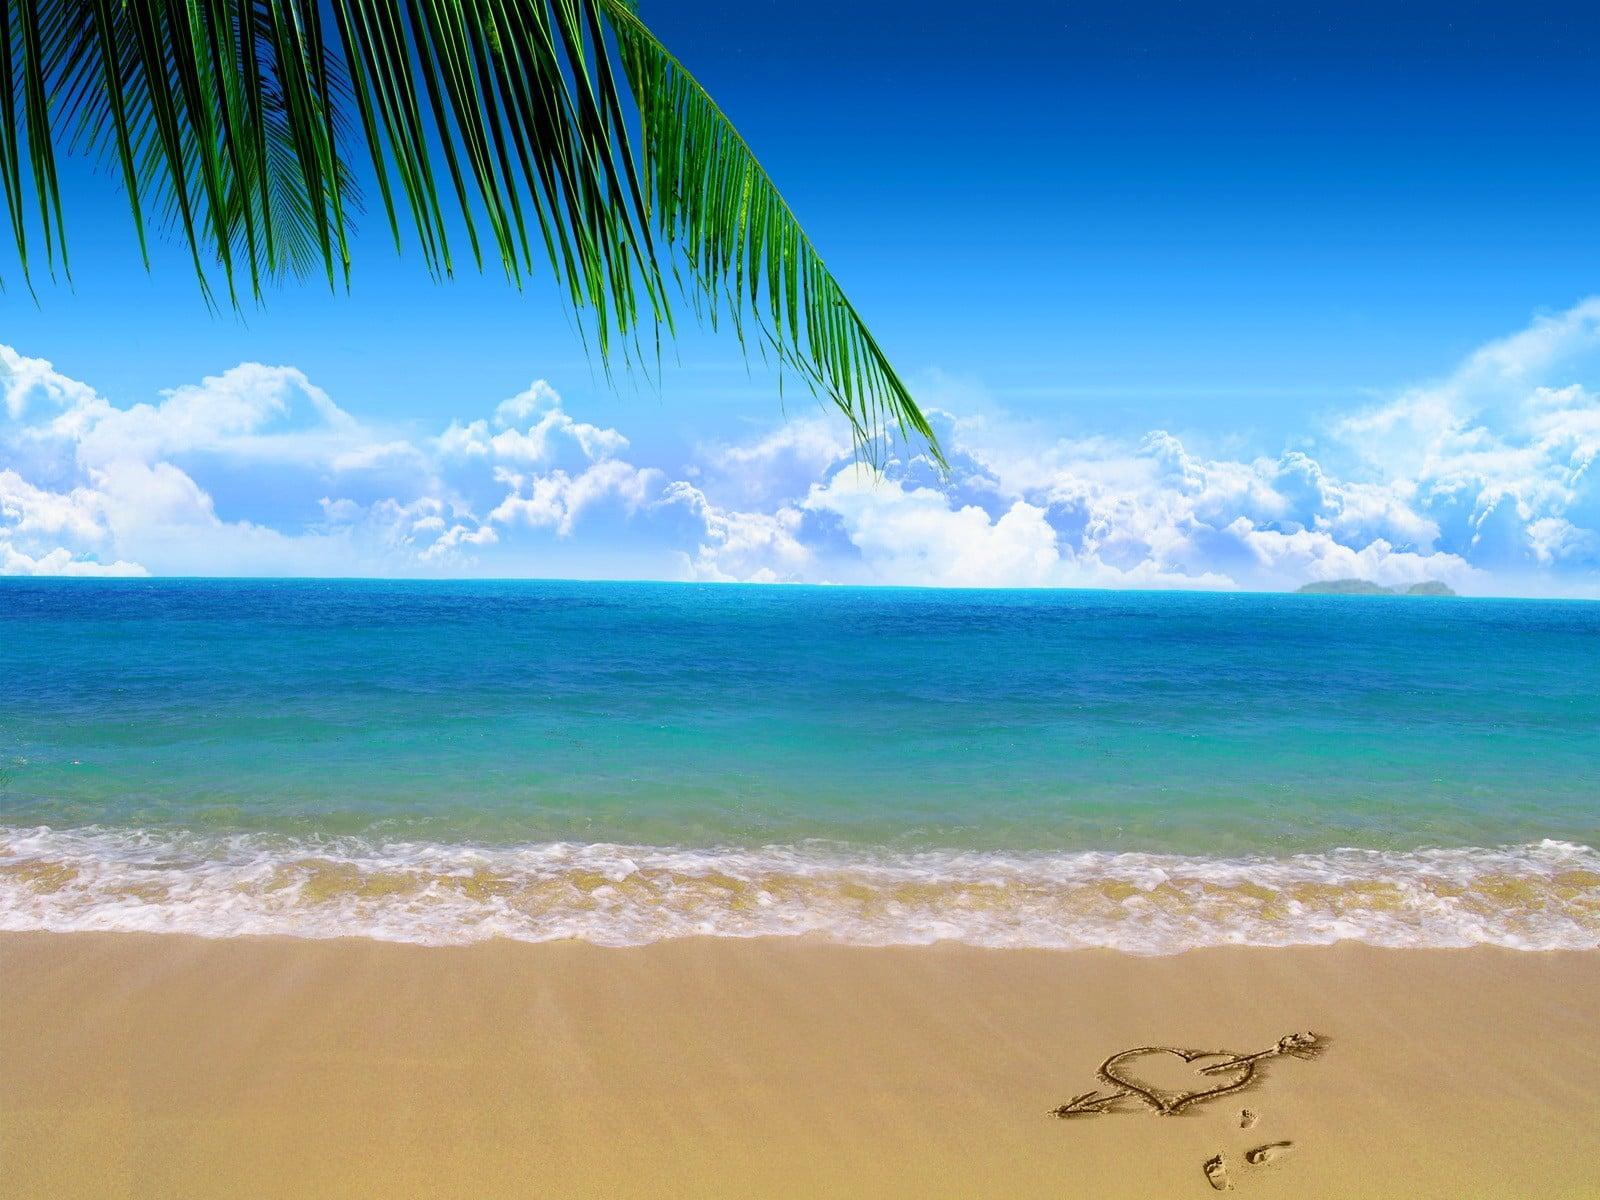 sahil kenarı